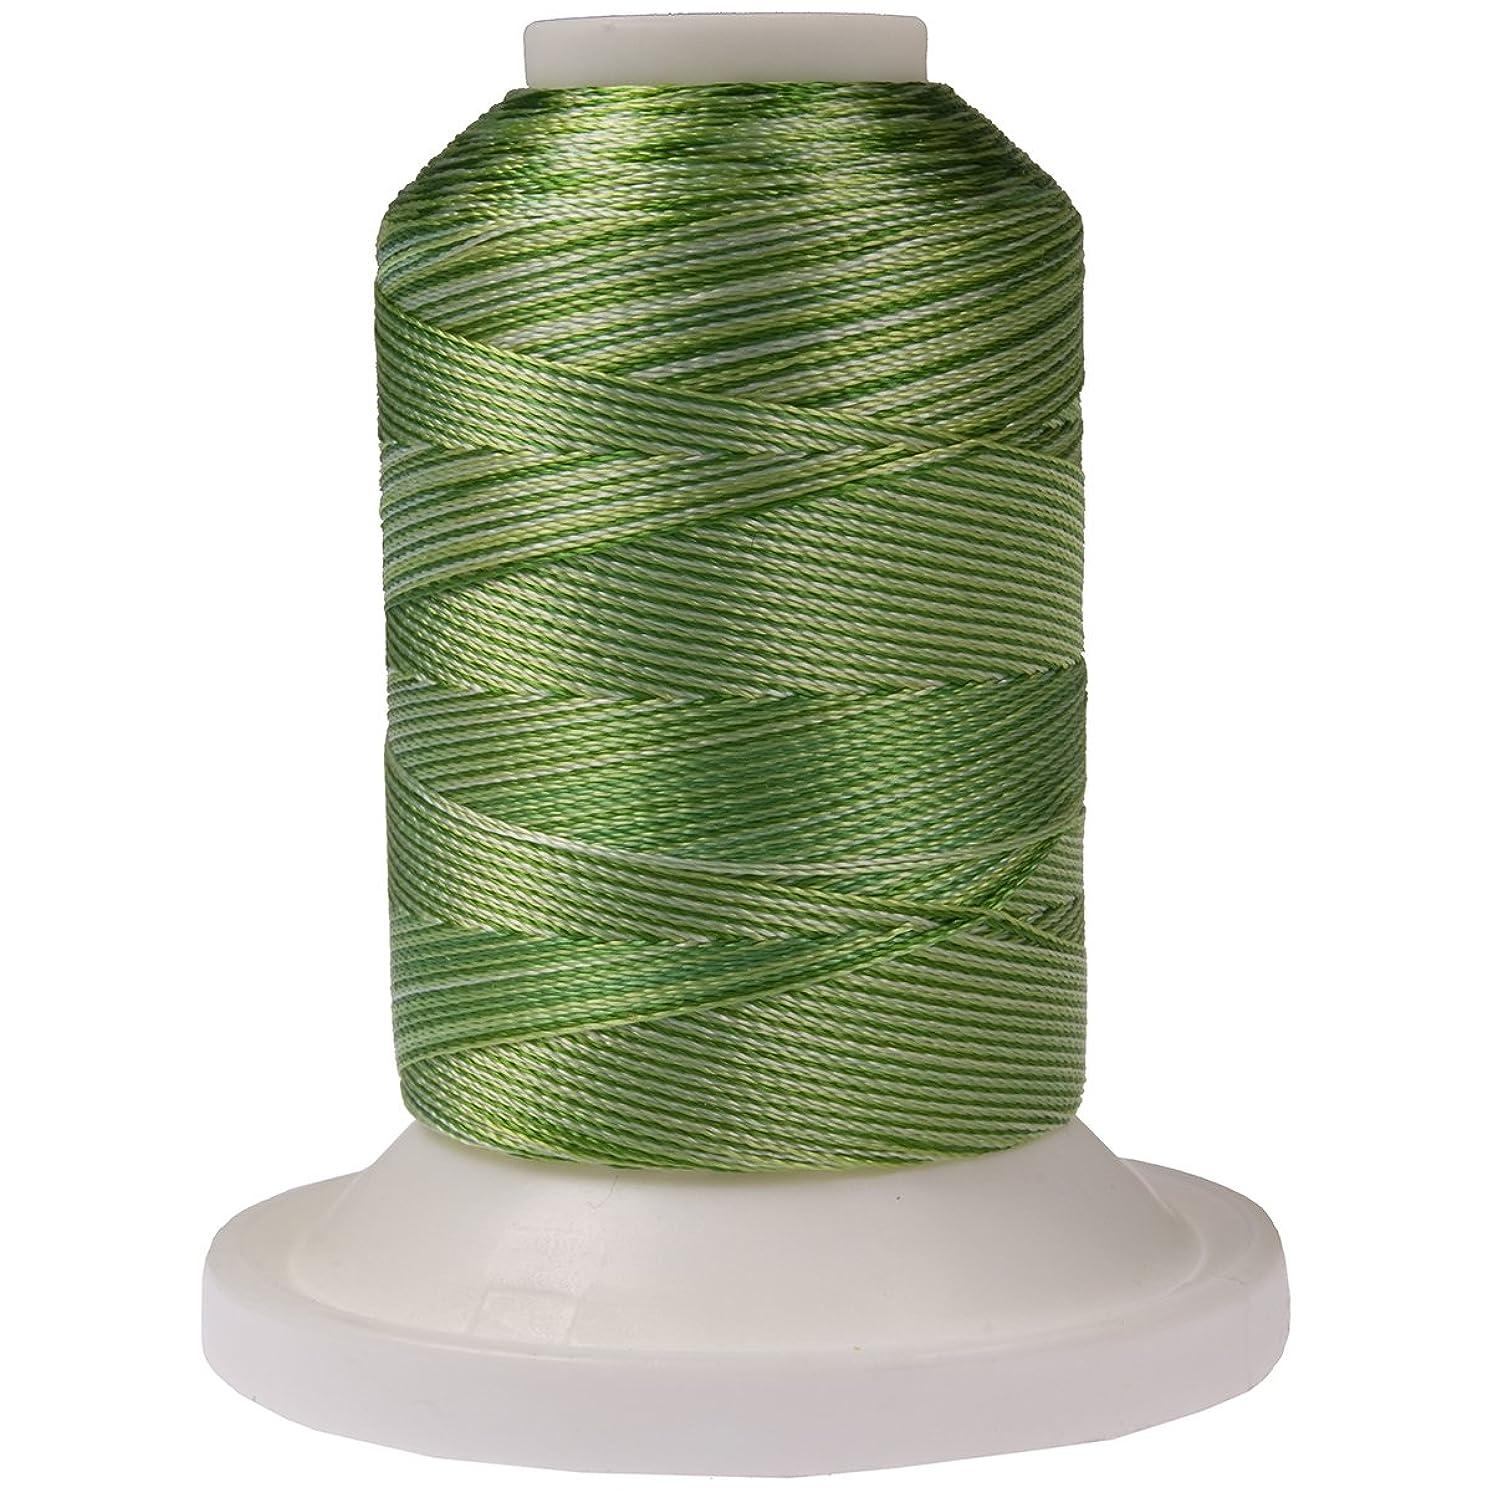 Robison-Anton Rayon Super Strength Thread, 700-Yard, 3CC Light Green